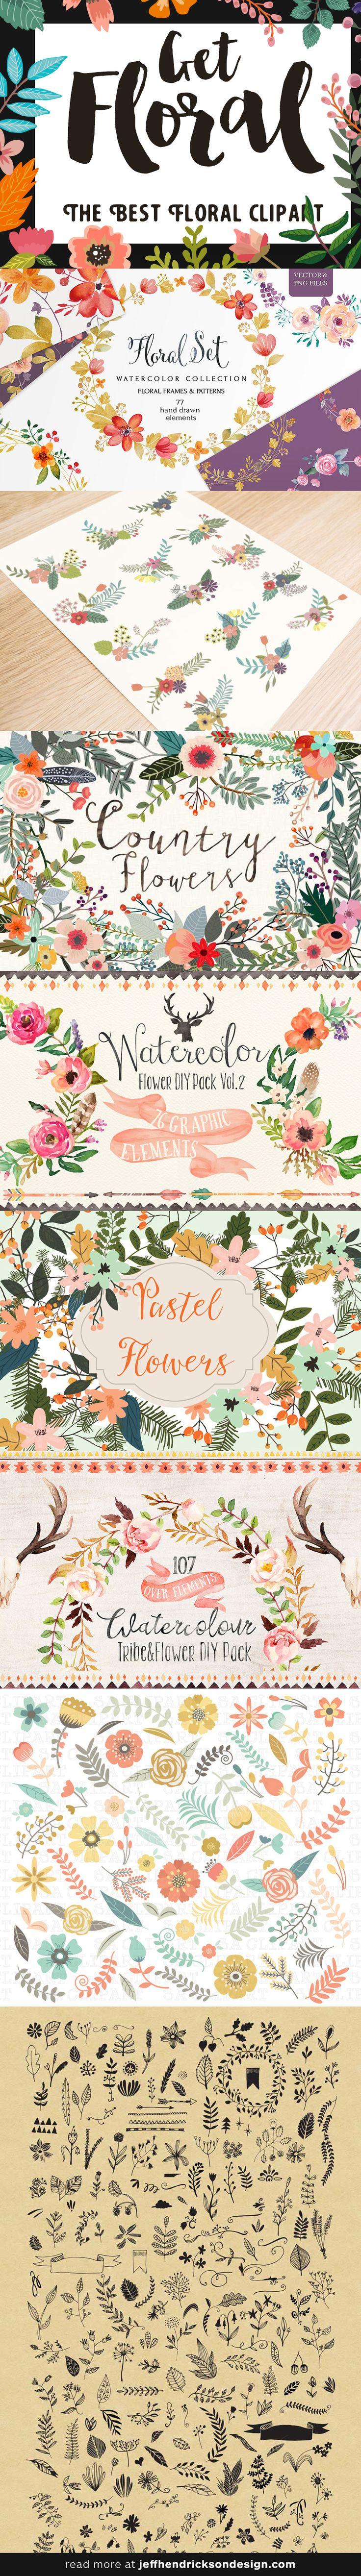 best invitations images on pinterest graphics art education